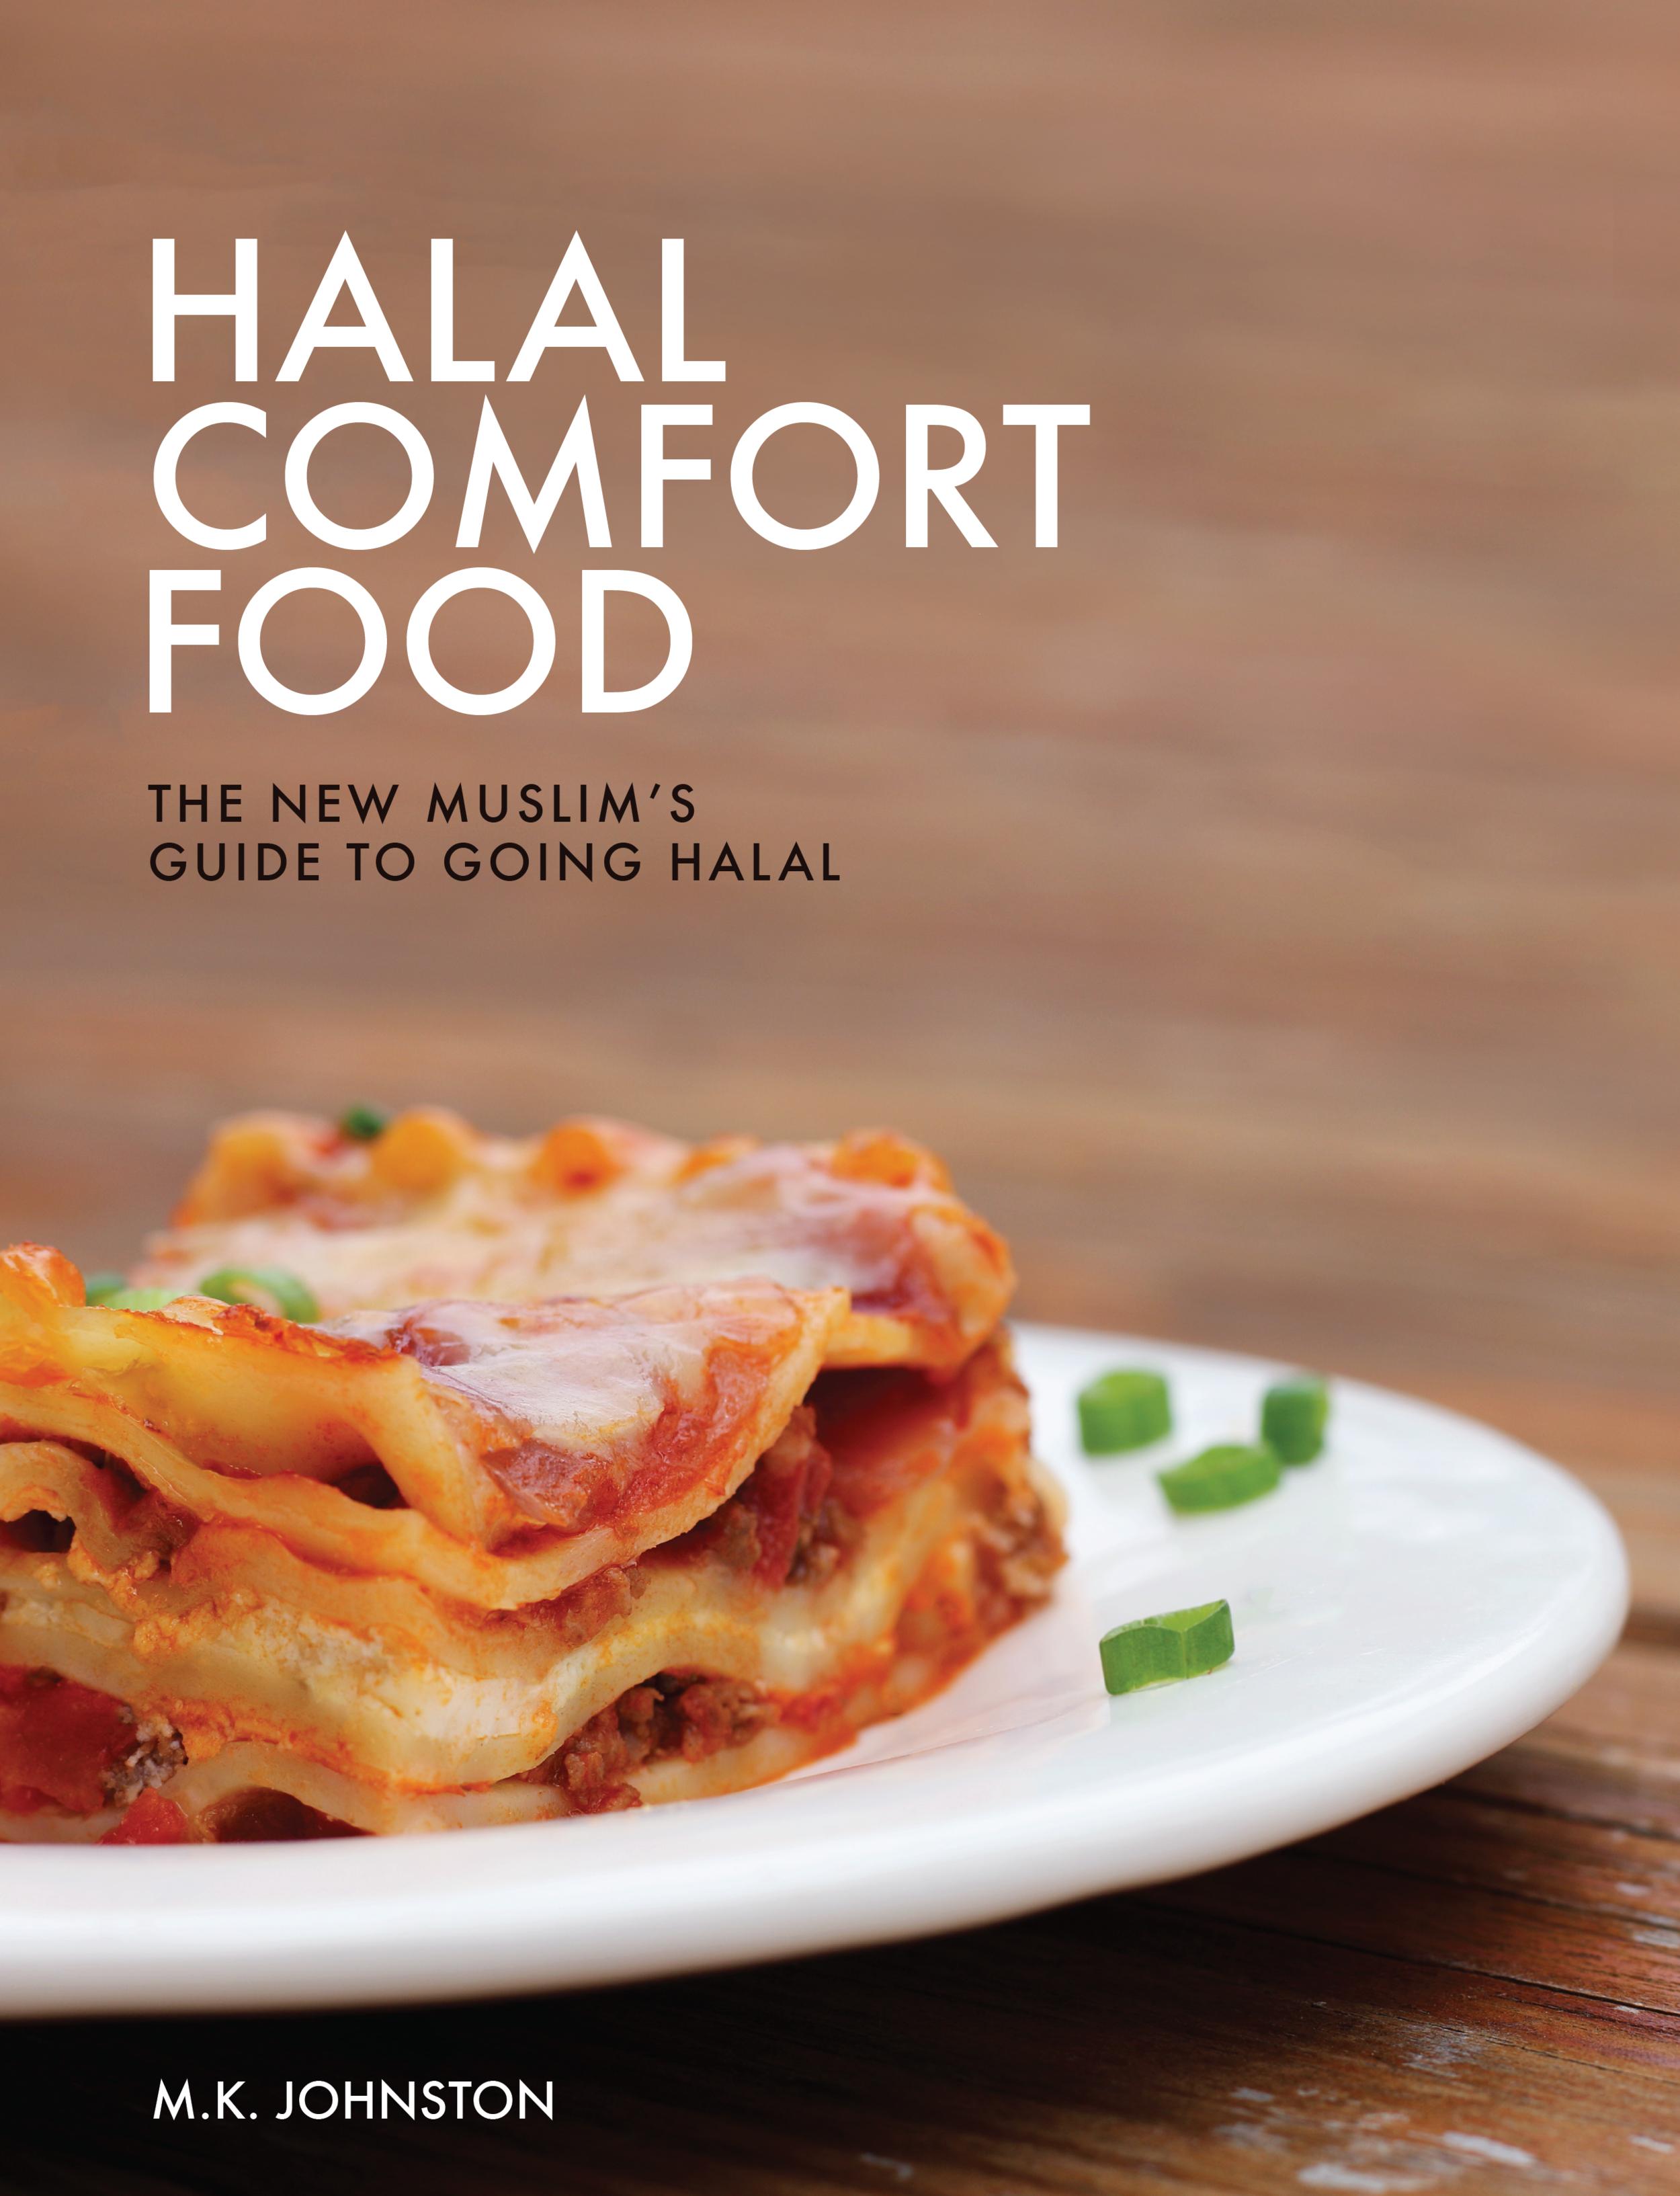 8.5x11_Color_120 Halal Comfort Food-front.png